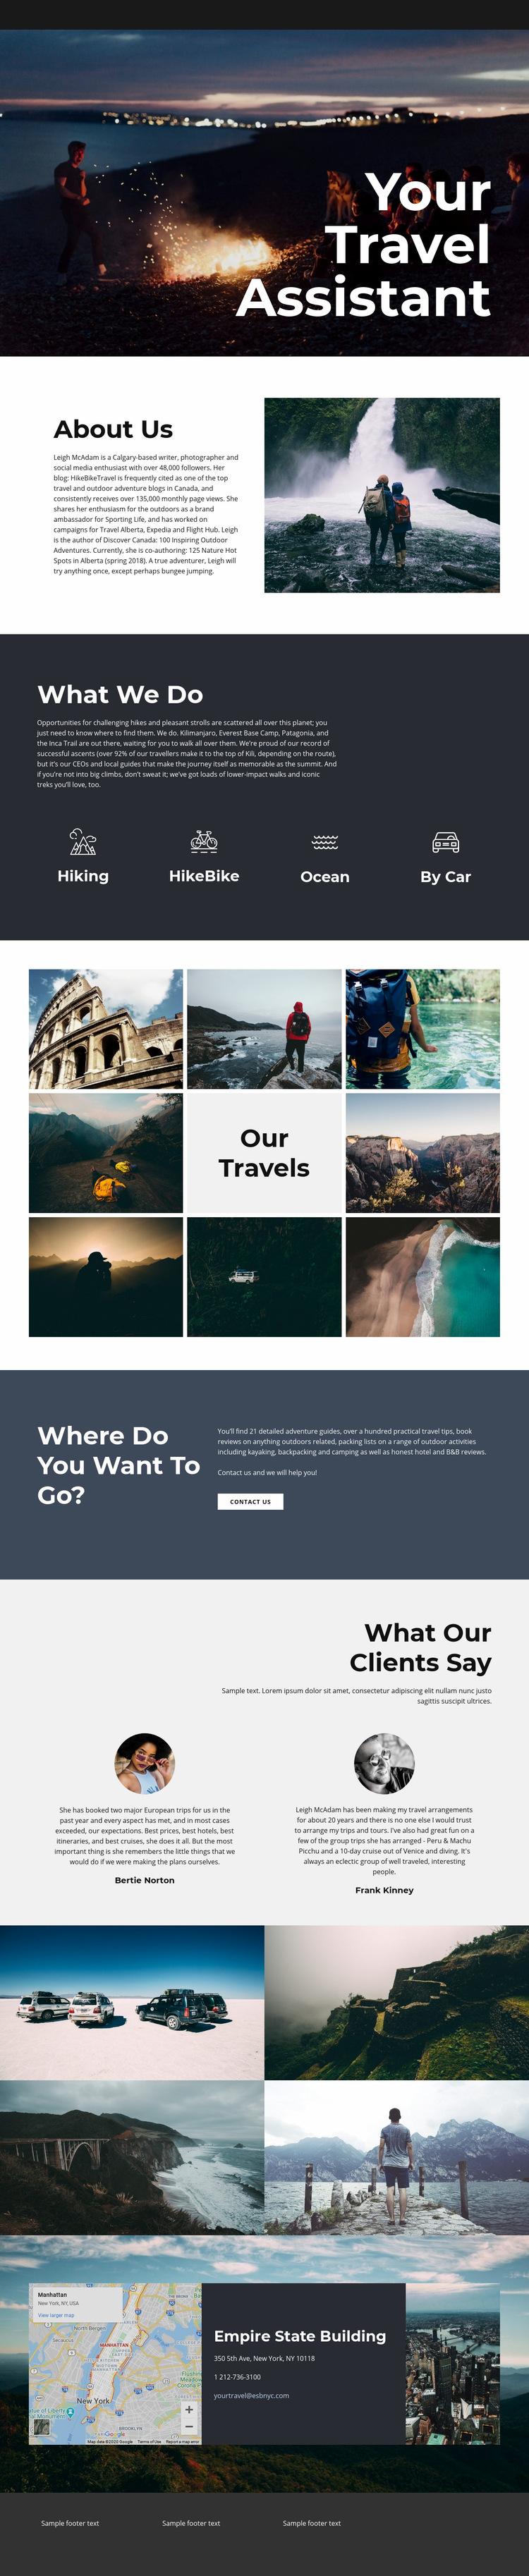 Travel Assistant Web Page Design